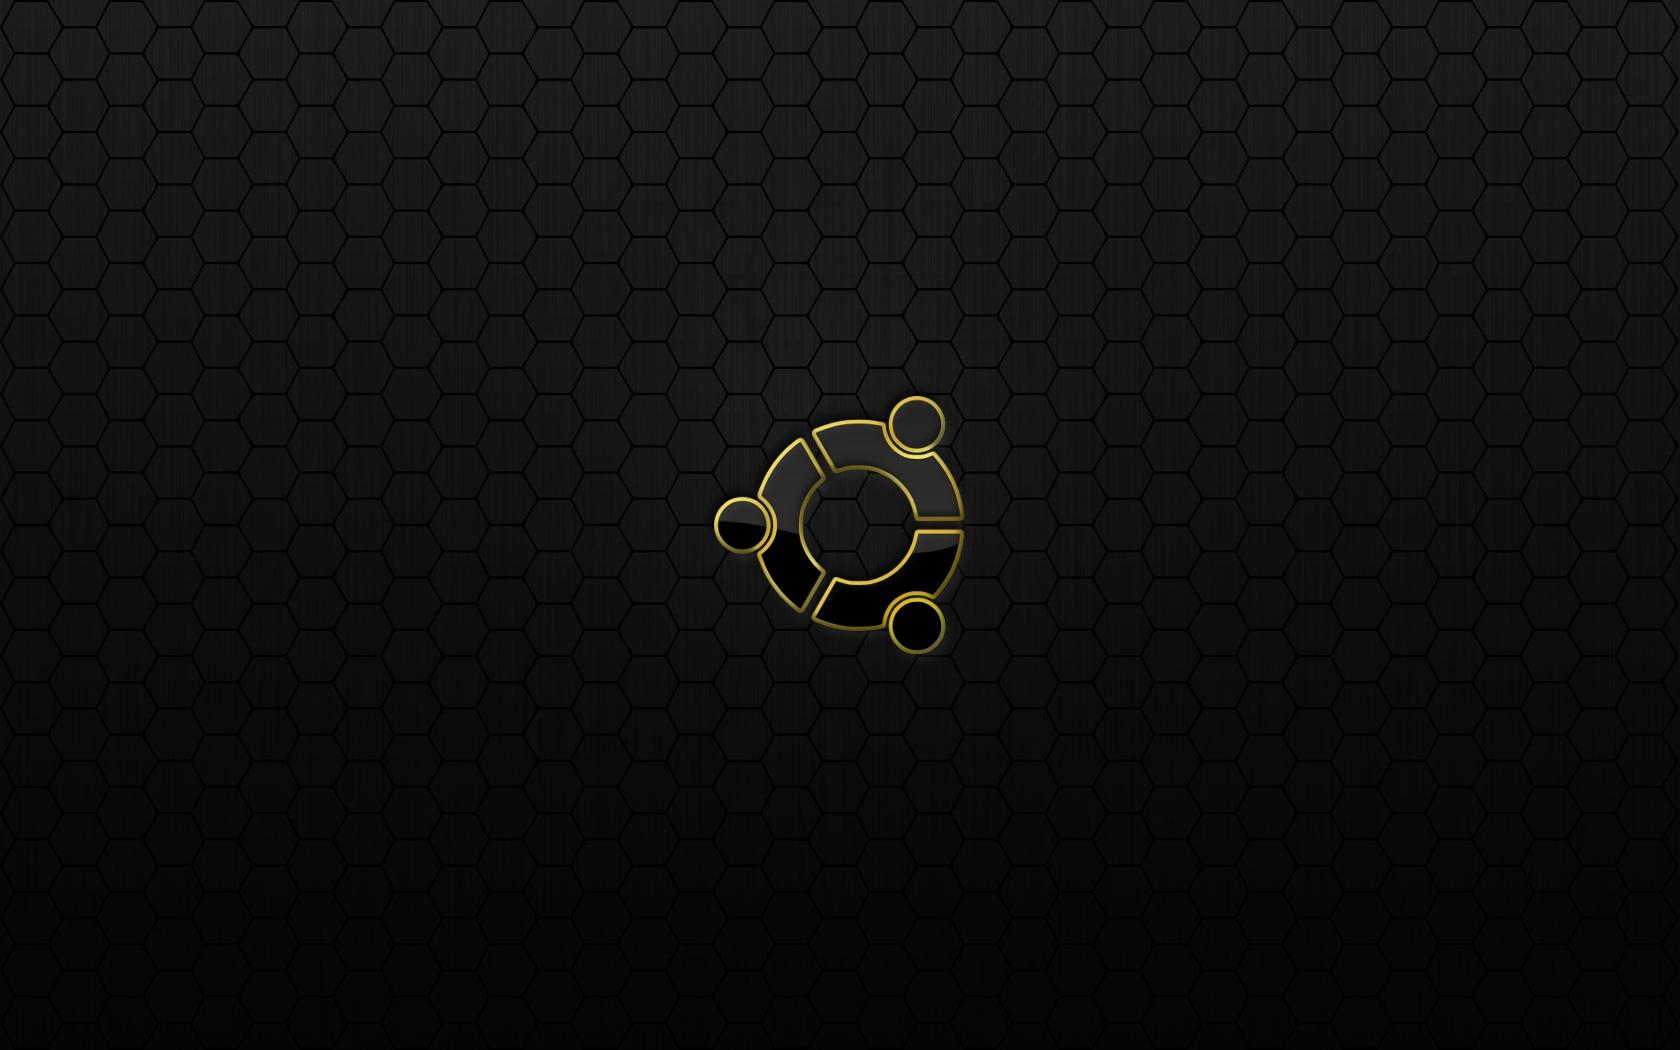 Dark Ubuntu Wallpaper 1680x1050